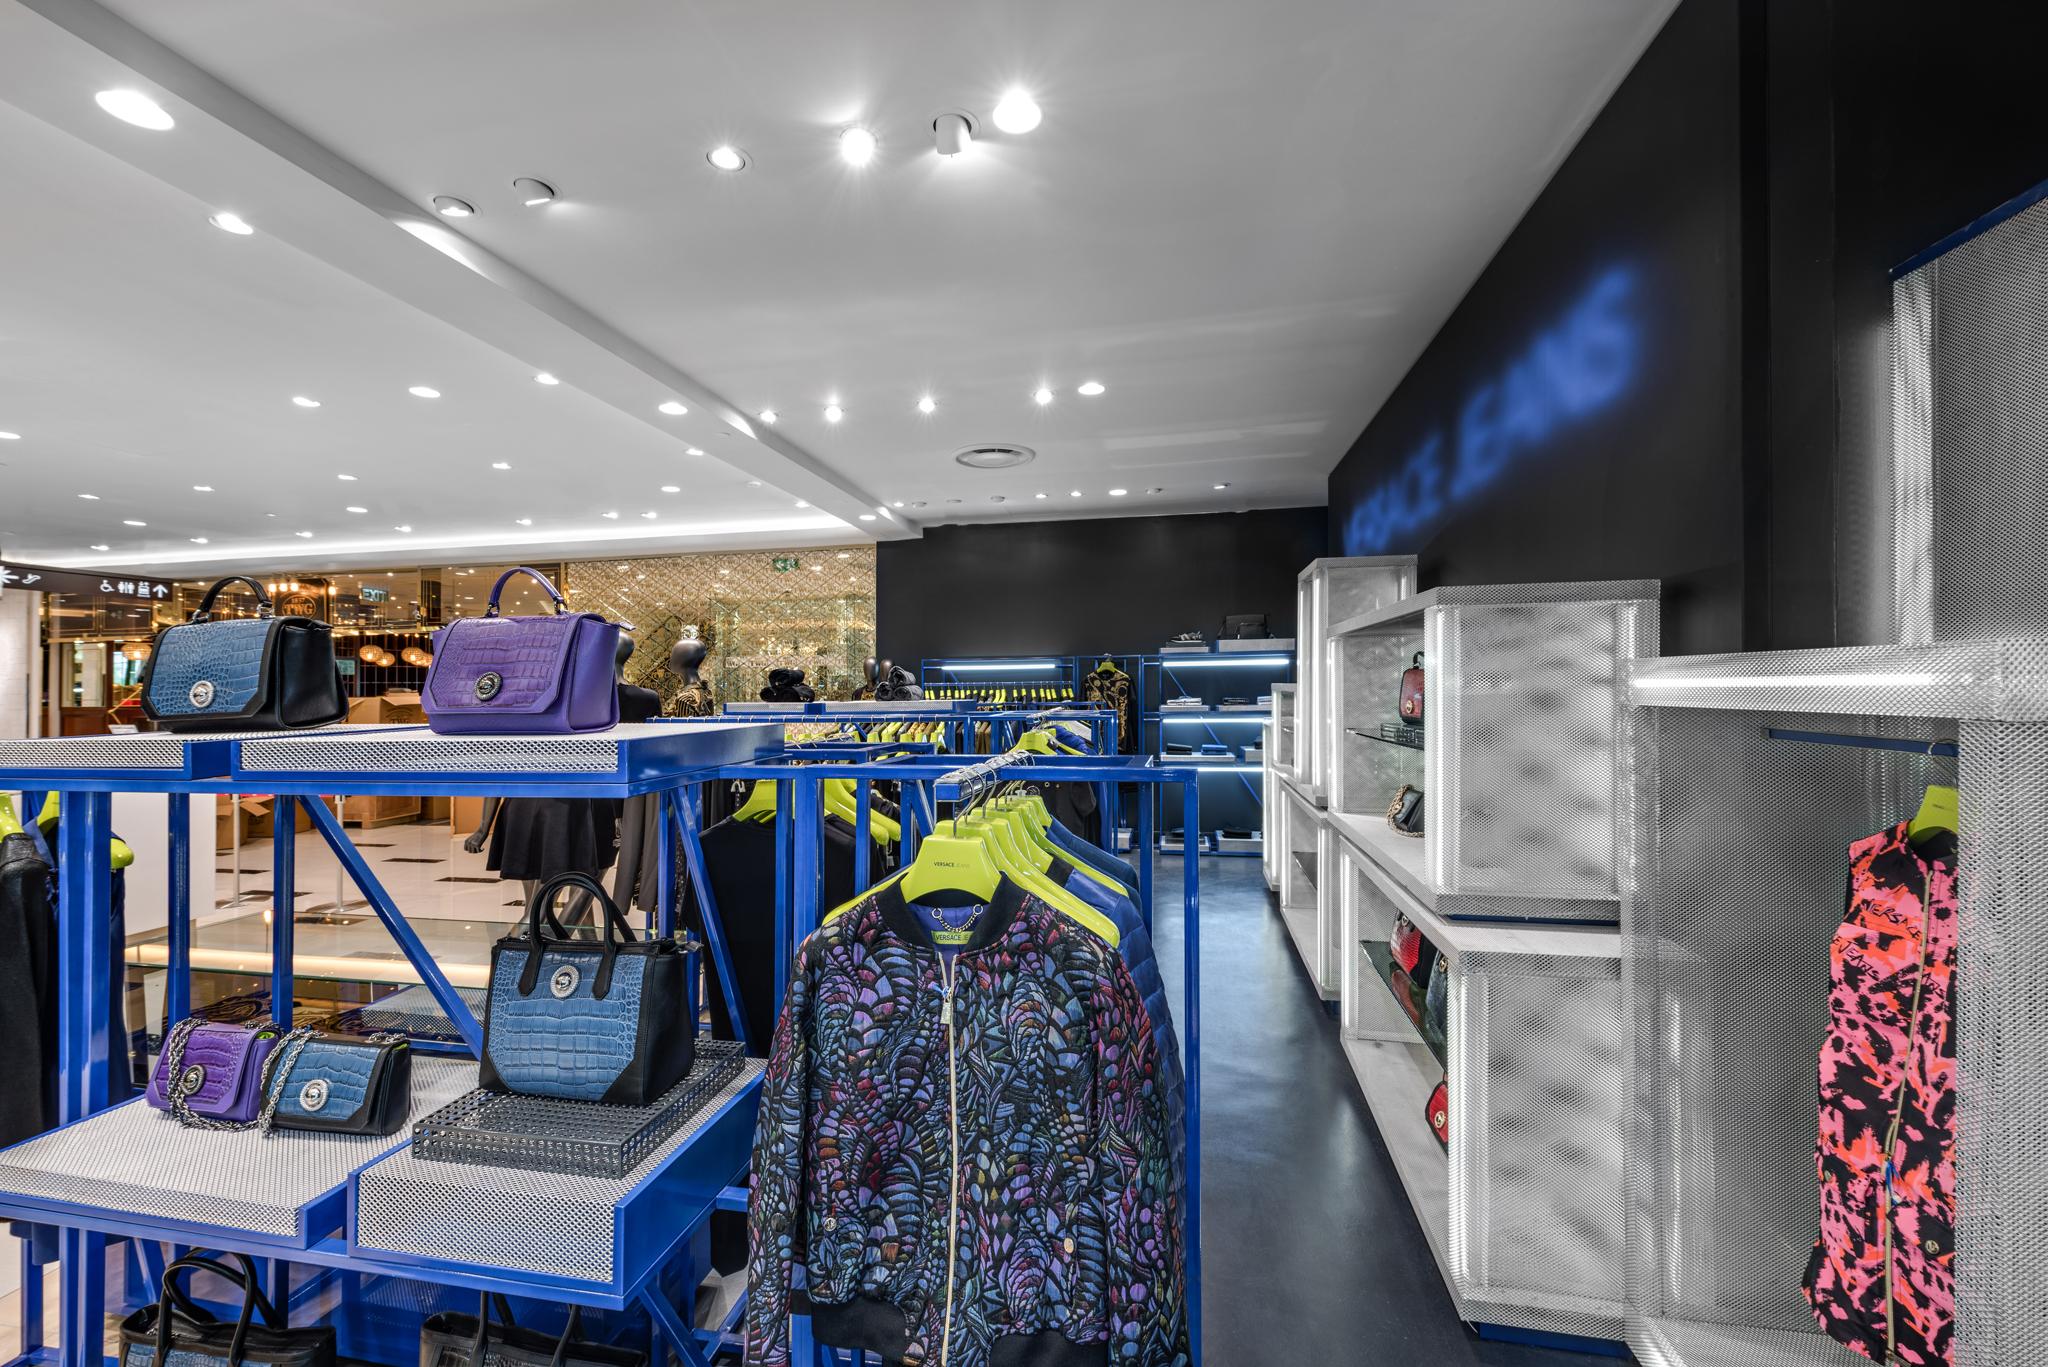 20160729 - Versace Jean - HCM - Commercial - Interior - Store - Retouch 0007.jpg